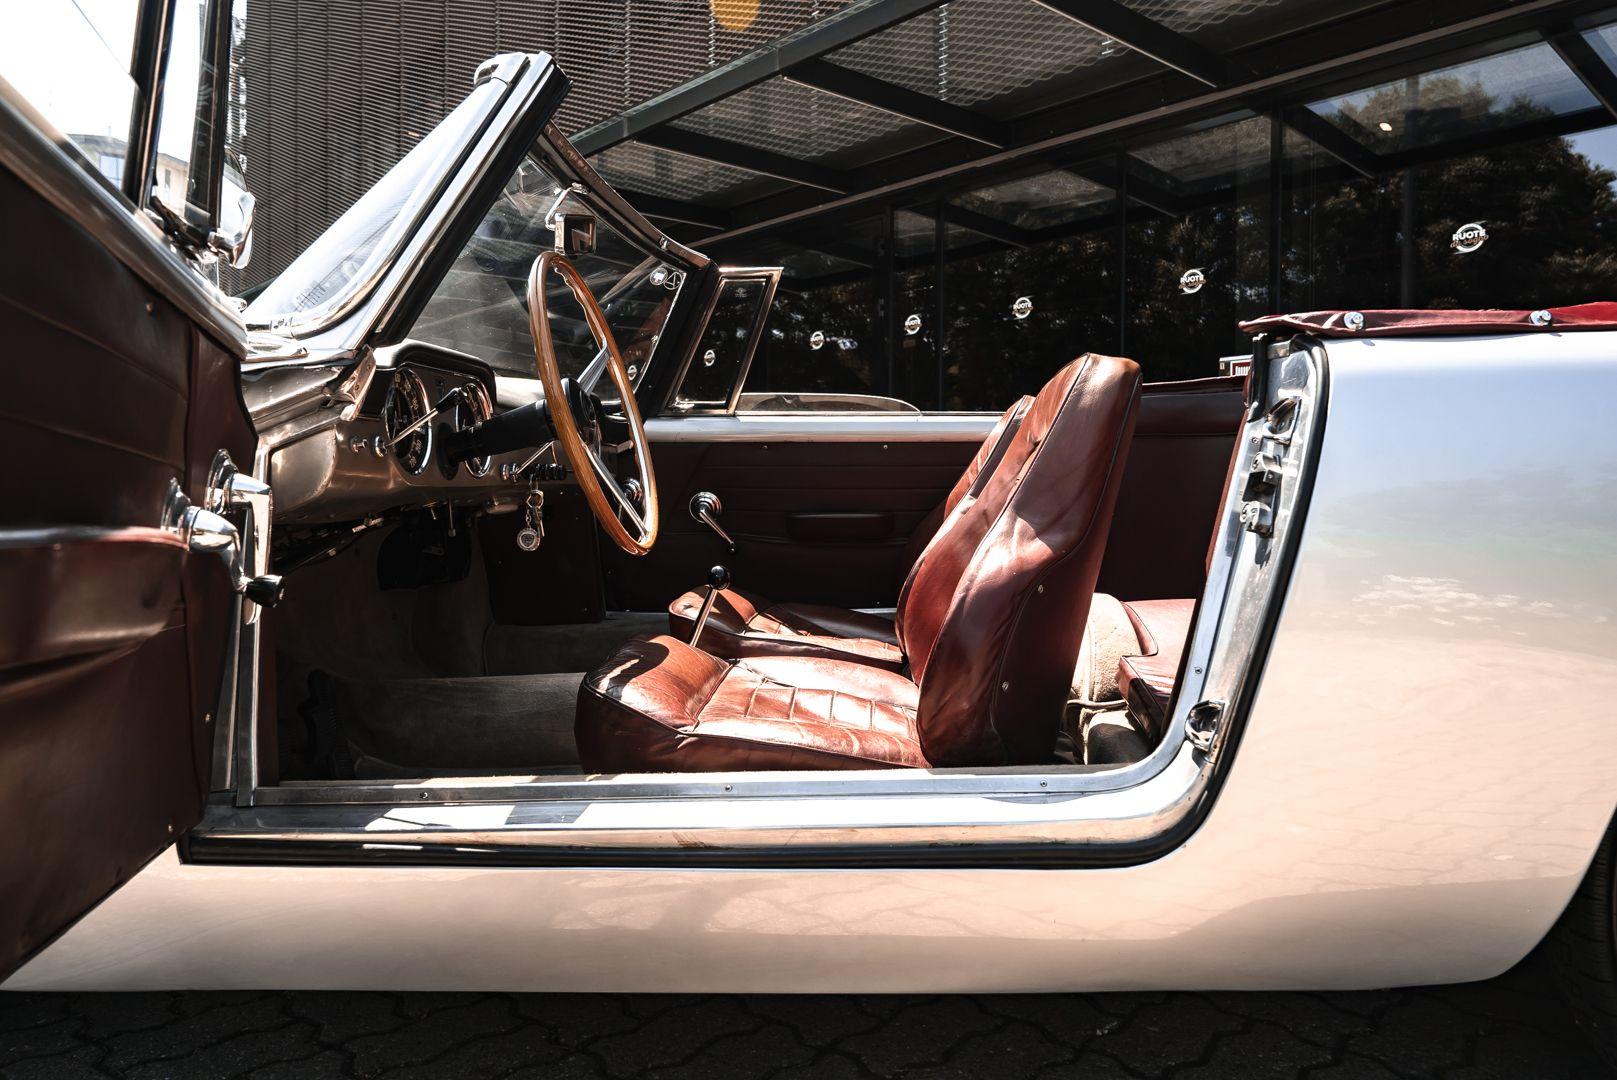 1963 Lancia Flaminia Touring Convertible 2500 3C  73158